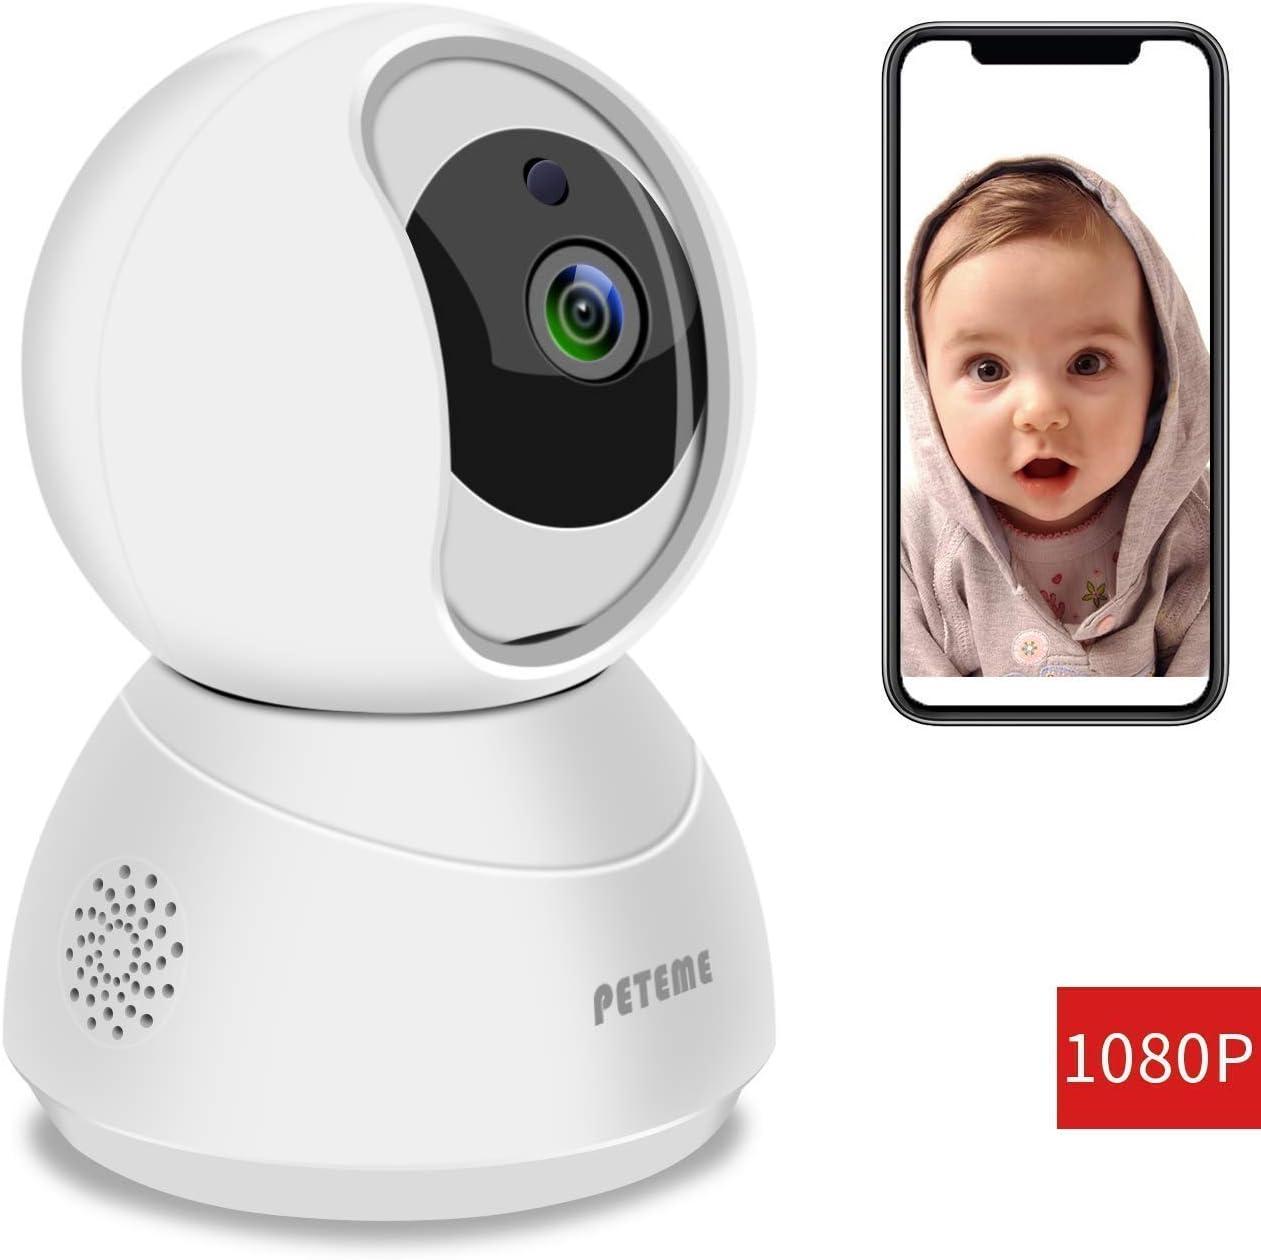 Peteme Baby Monitor